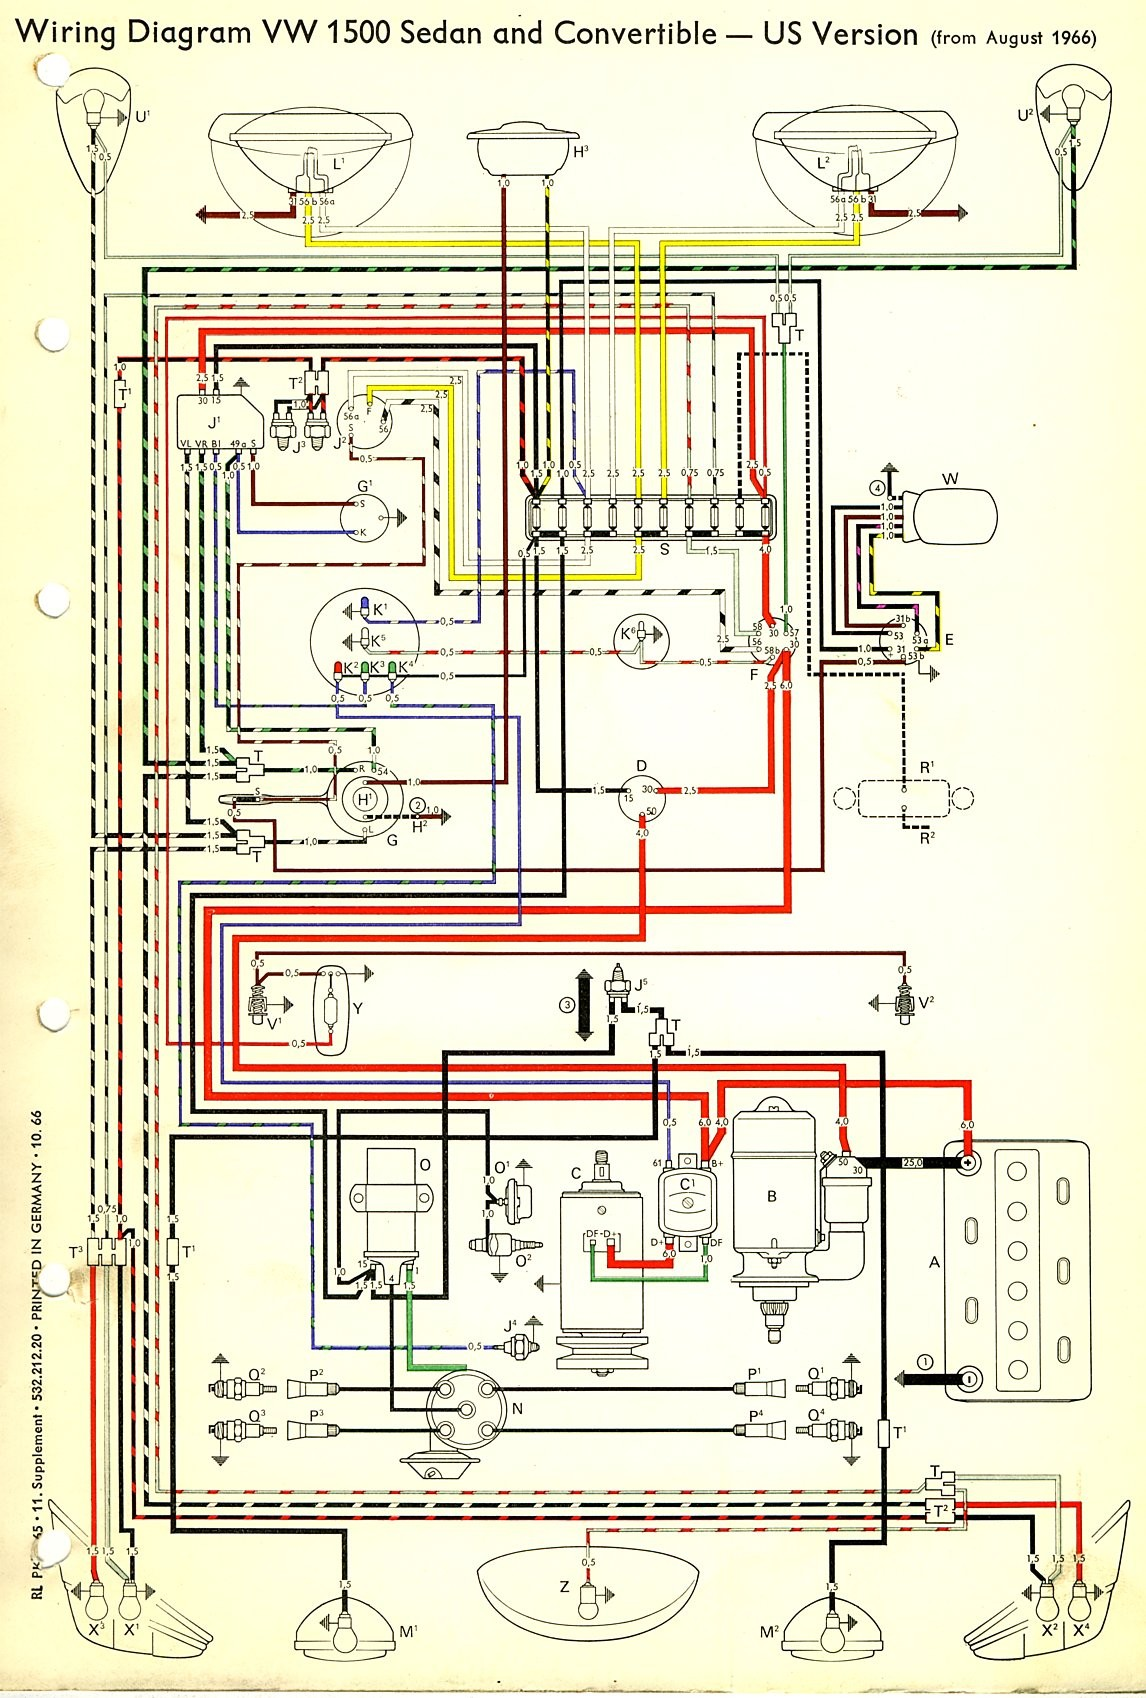 2001 vw beetle 2 0 engine diagram 1974 vw bug wiring diagram page rh detoxicrecenze com VW Beetle Engine Diagram VW Beetle Engine Diagram